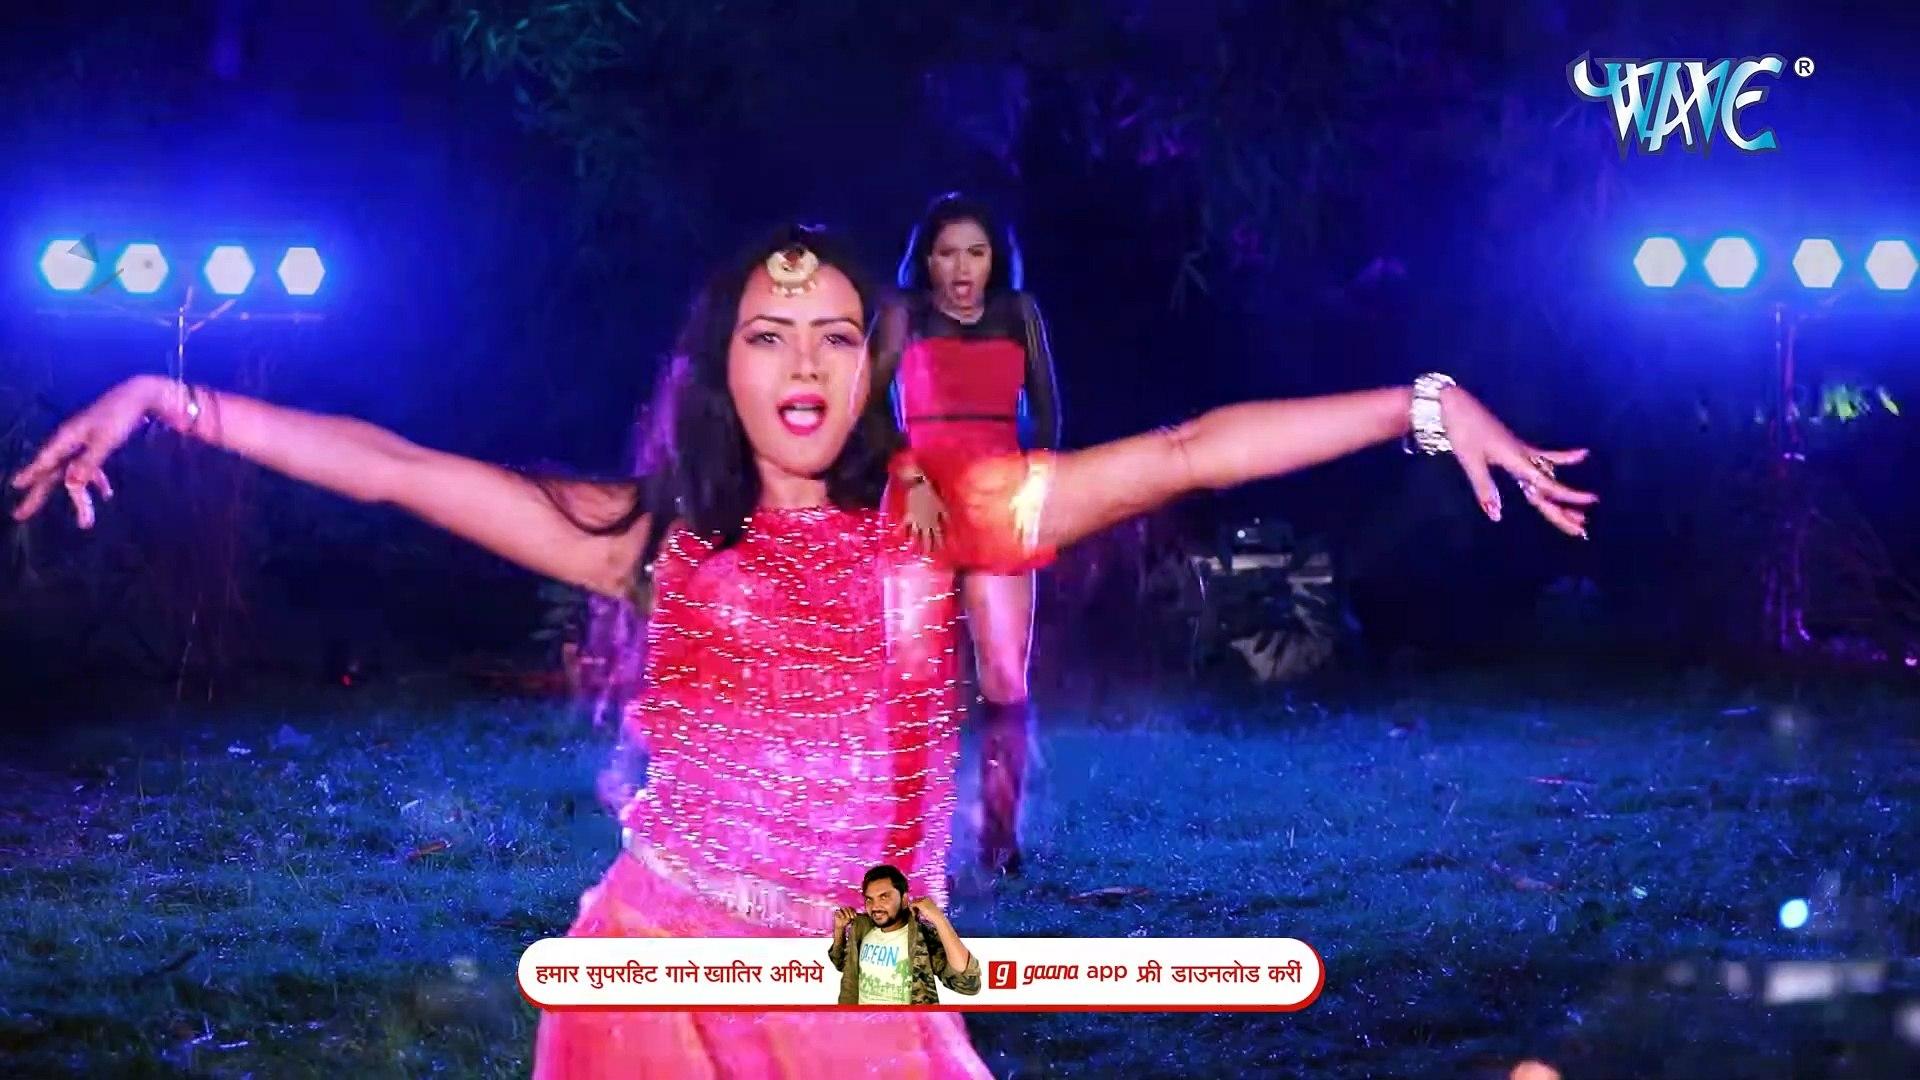 Video - शादी के बाद रोना पड़ेगा I #Gunjan Singh, Antra Singh Priyanka I  2020 Bhojpuri Superhit Song - video dailymotion